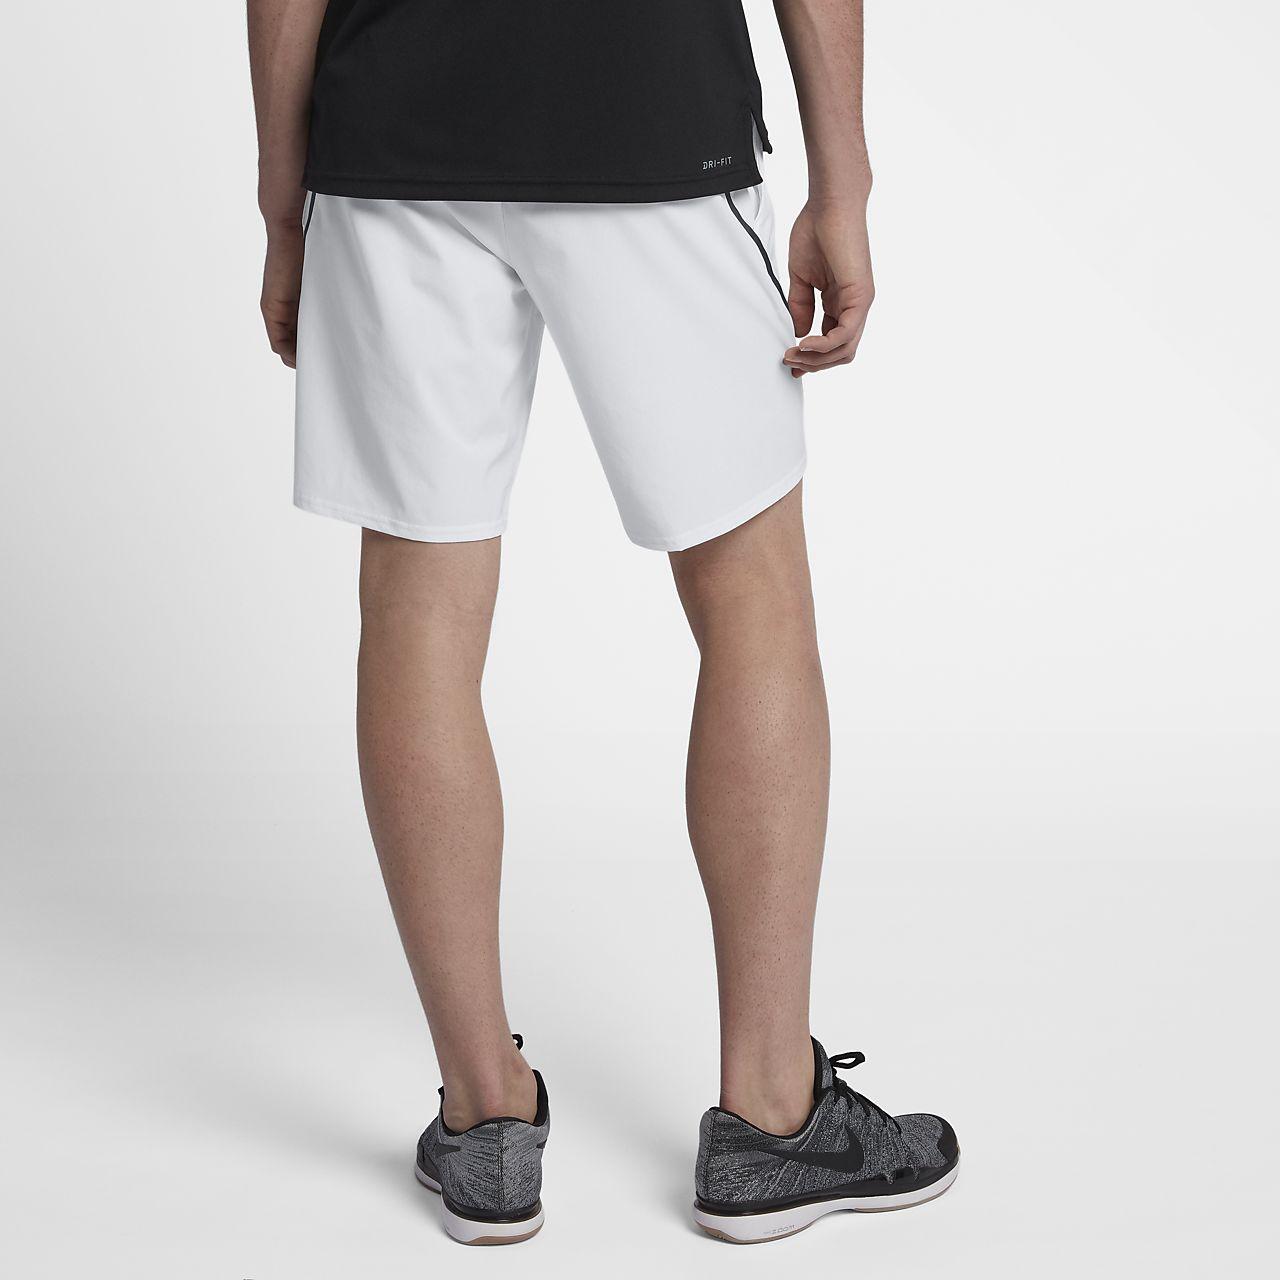 c093da464 NikeCourt Flex Ace Men's Tennis Shorts. Nike.com